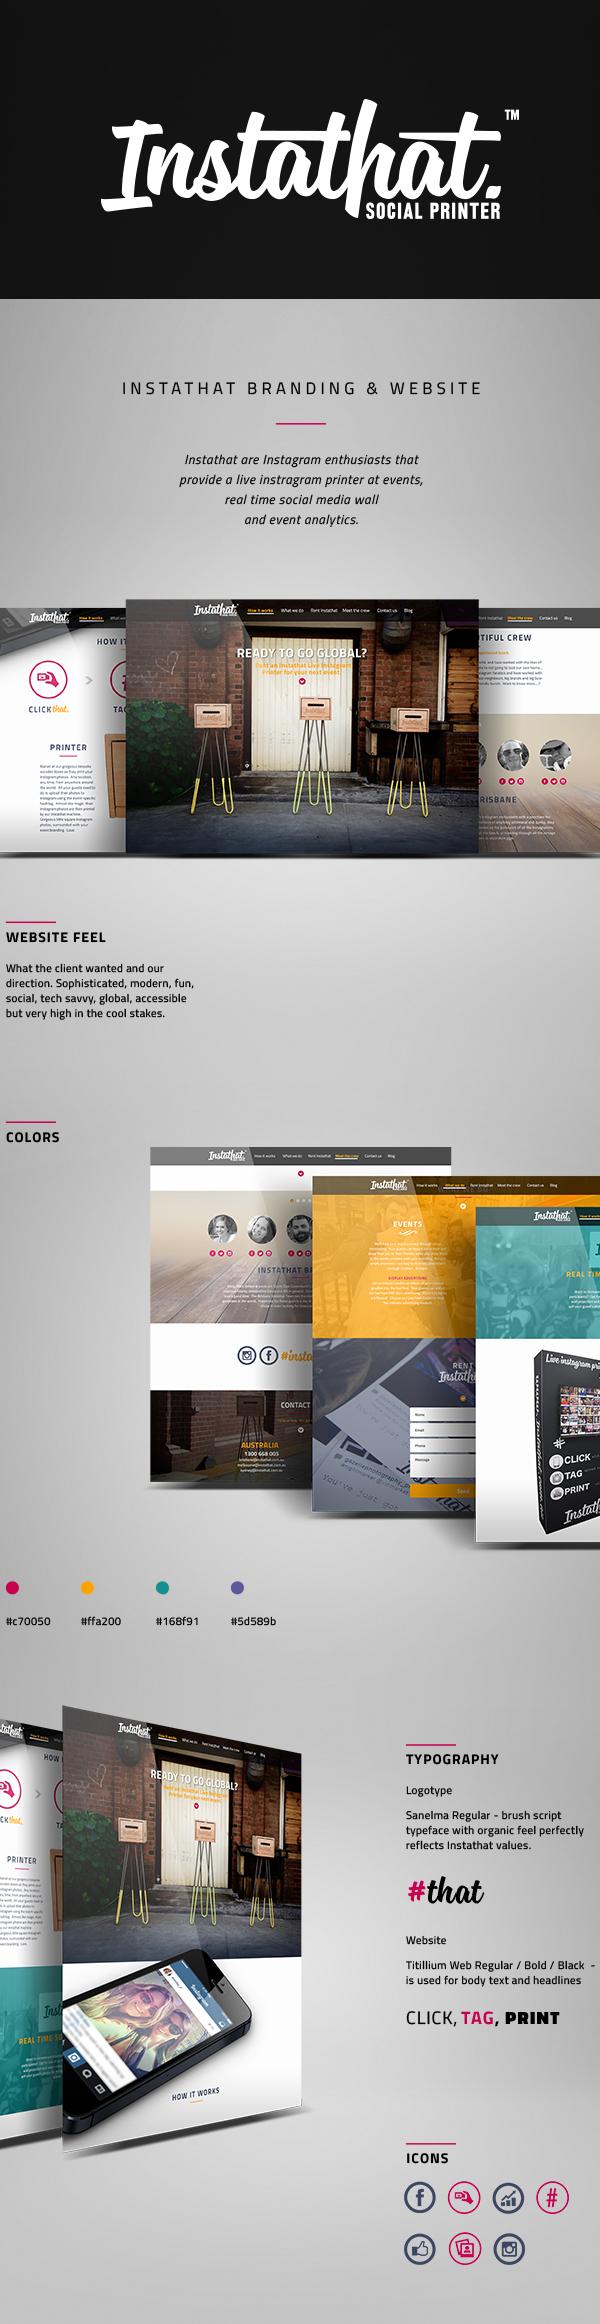 instagram instathat Website printer sophisticated modern Fun social cool colors logo Responsive mobile Hero